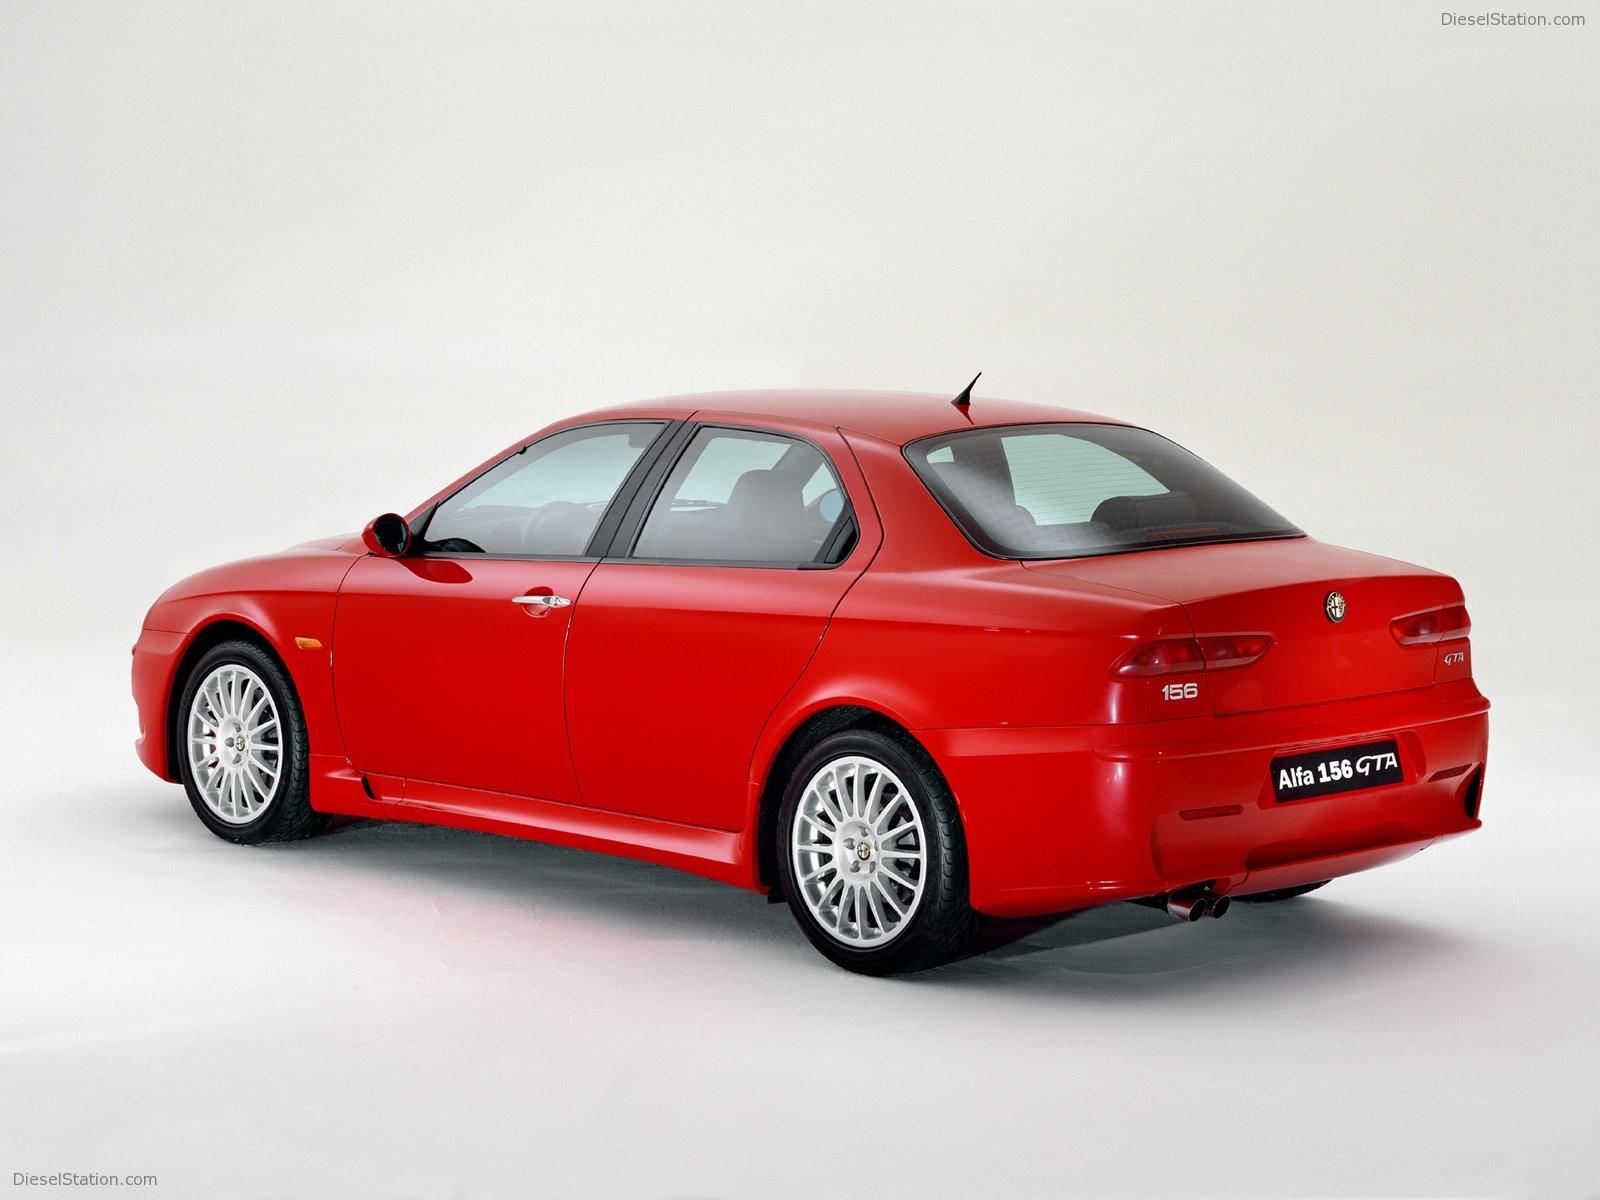 Alfa Romeo 156 GTA High Resolution Image Desktop Backgrounds